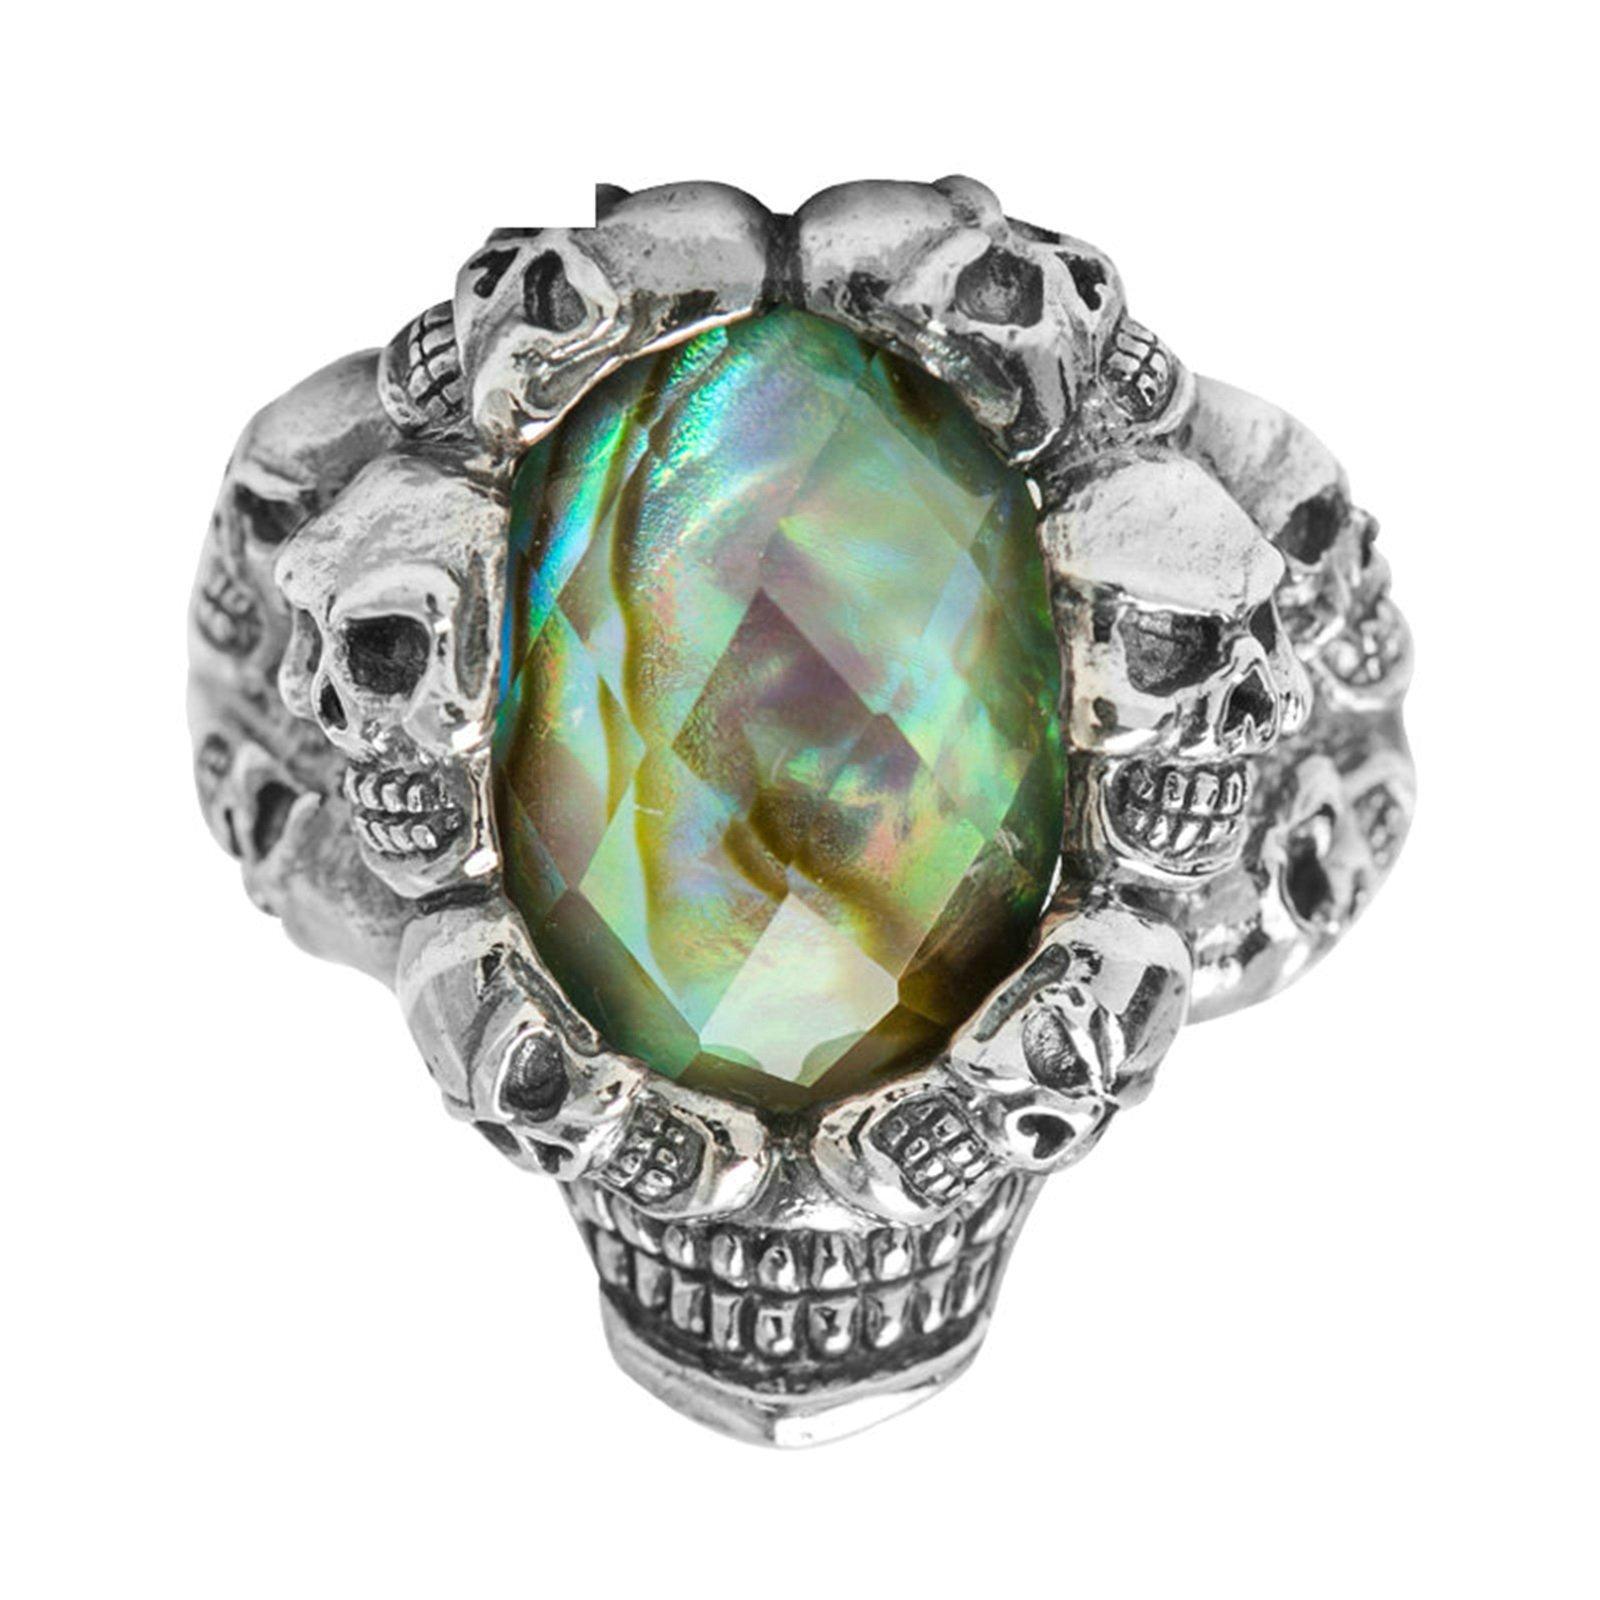 Beydodo Mens Silver Ring, Skull Ring Colorful Cubic Zirconia Size 11 Punk Biker Ring Bands